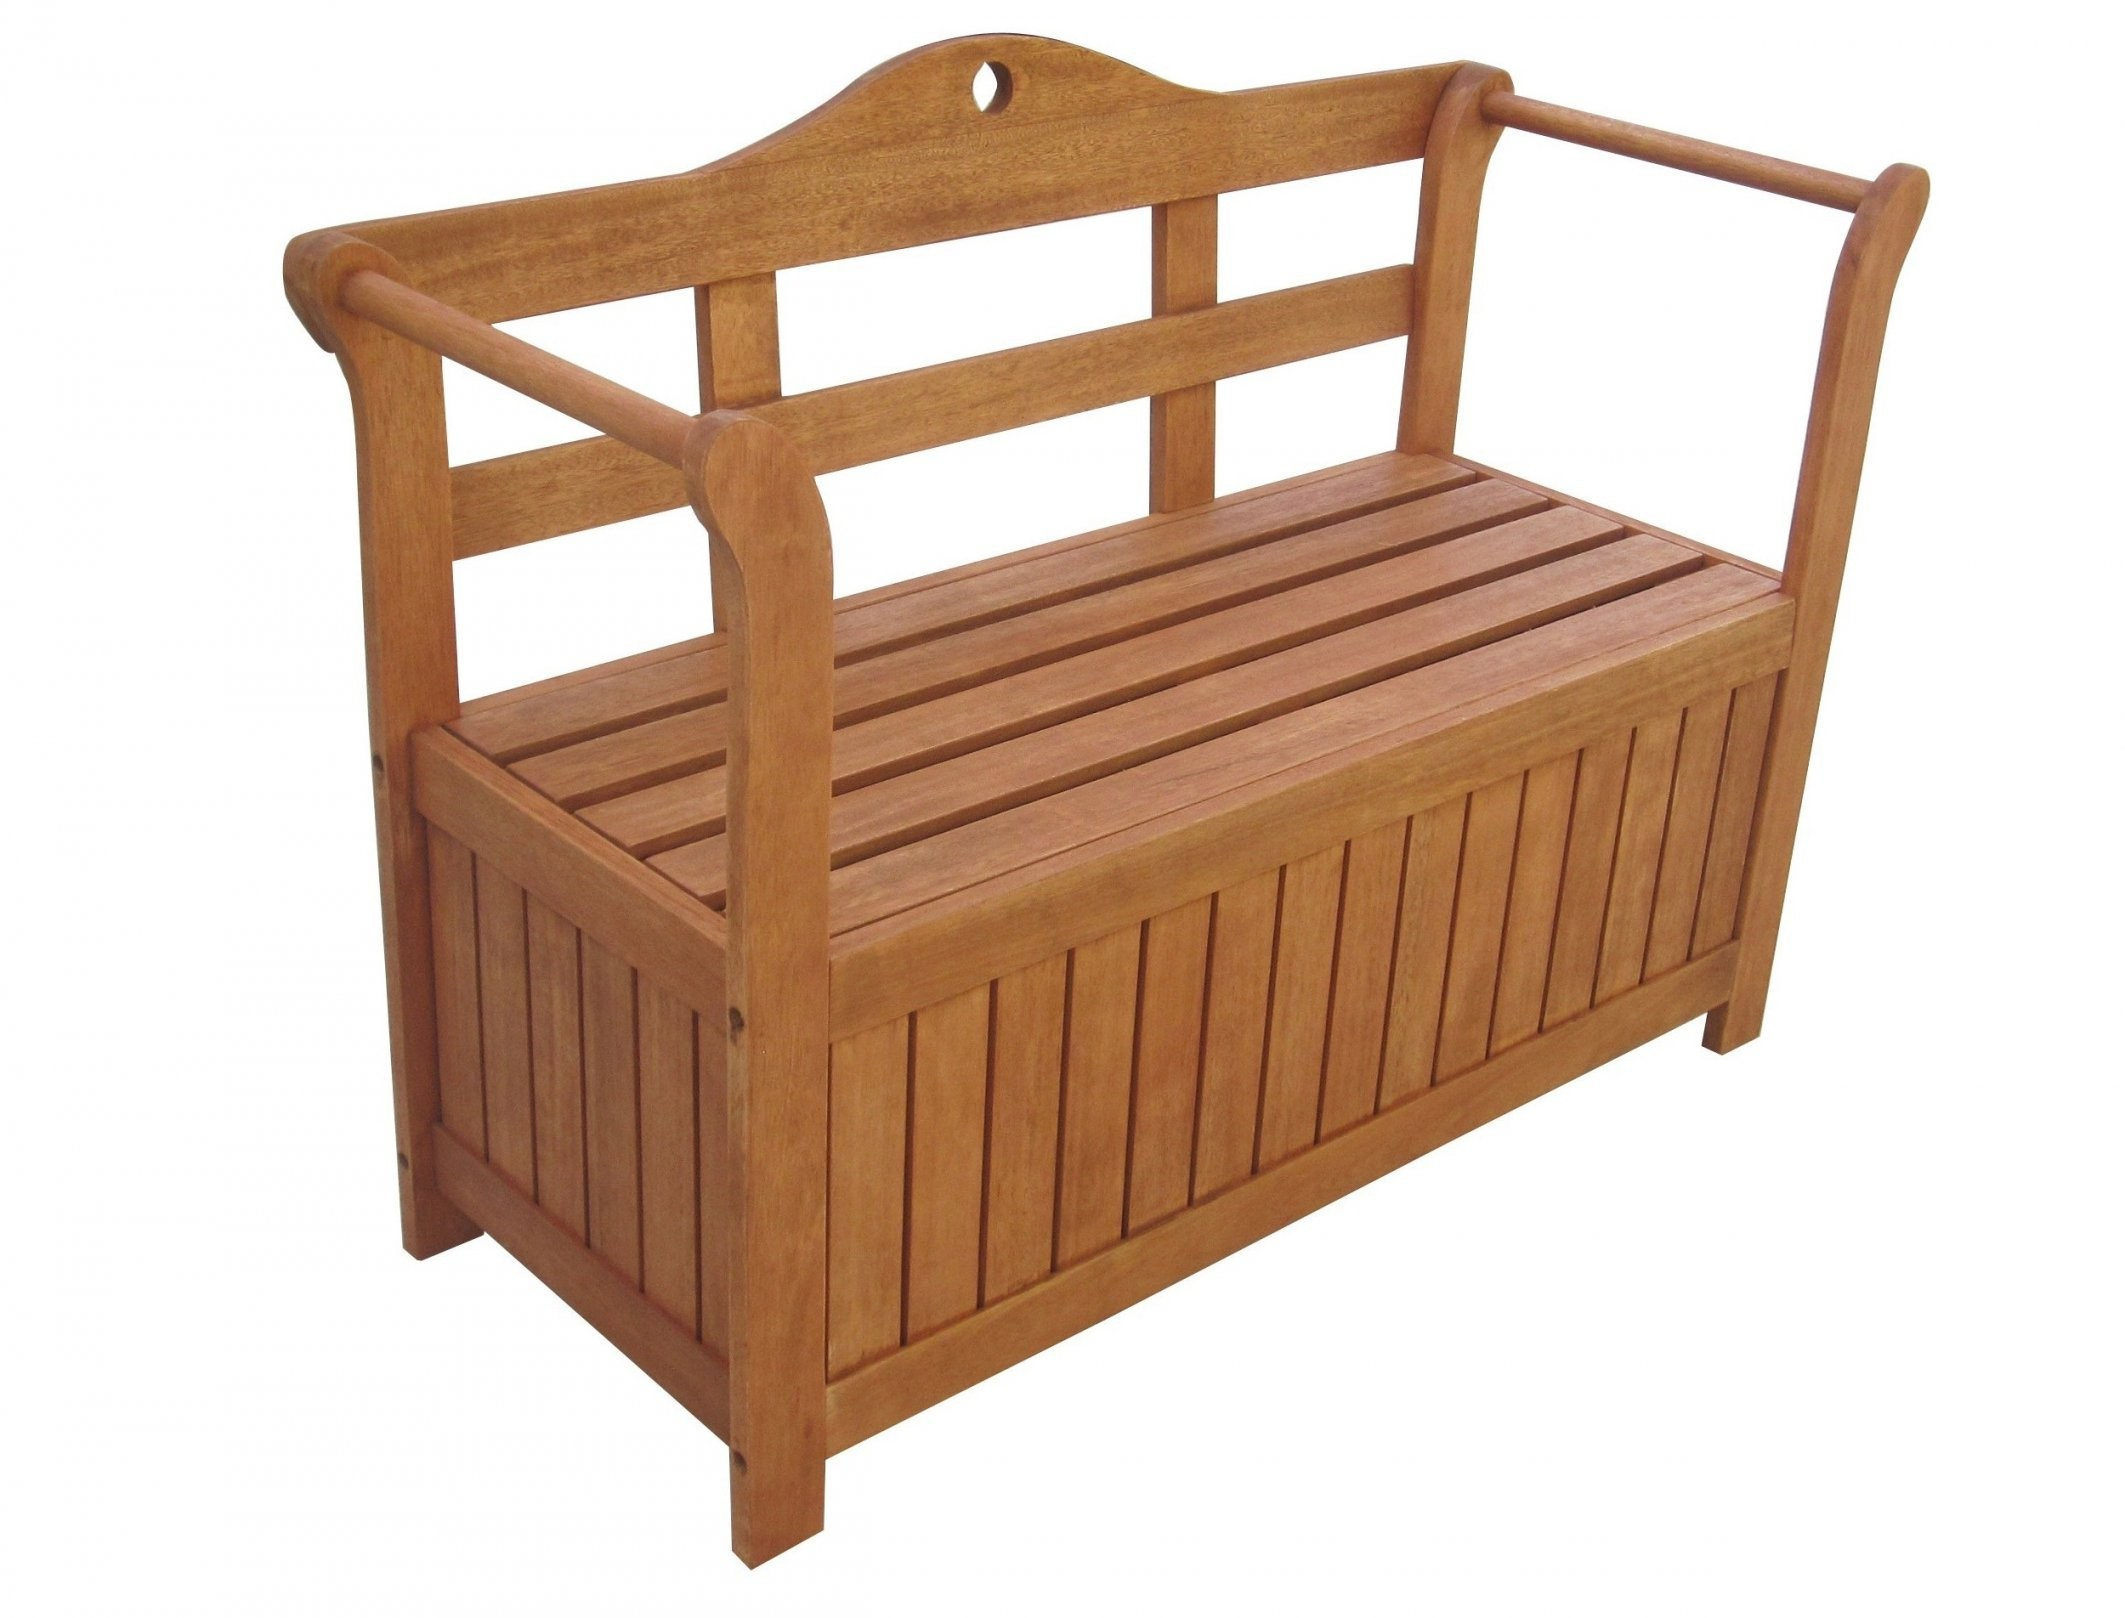 Sitzbank Entzückend Garten Sitzbank Mit Truhe Design Aufregend von Garten Sitzbank Mit Truhe Bild